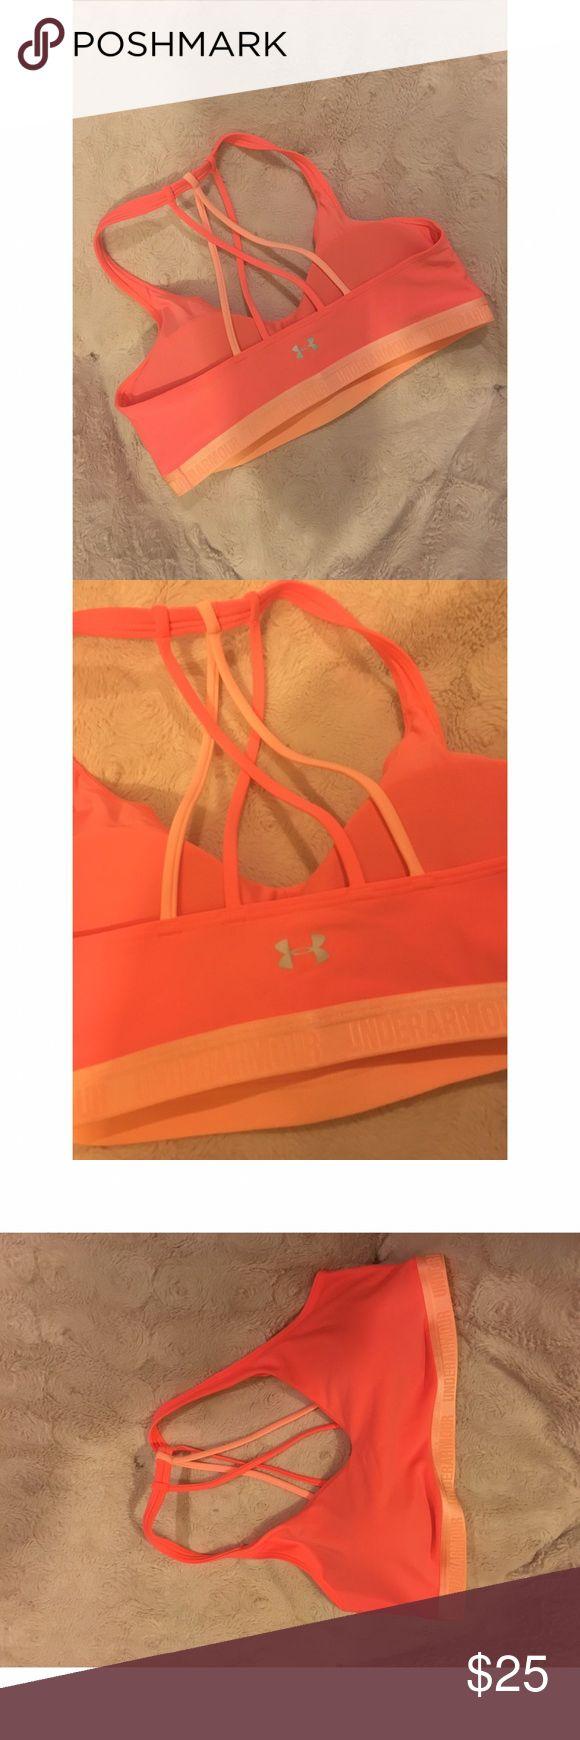 NWOT under Armour sports bra size L Large under Armour orange sports bra. Never tried on never worn. Open racer back. Under Armour Intimates & Sleepwear Bras